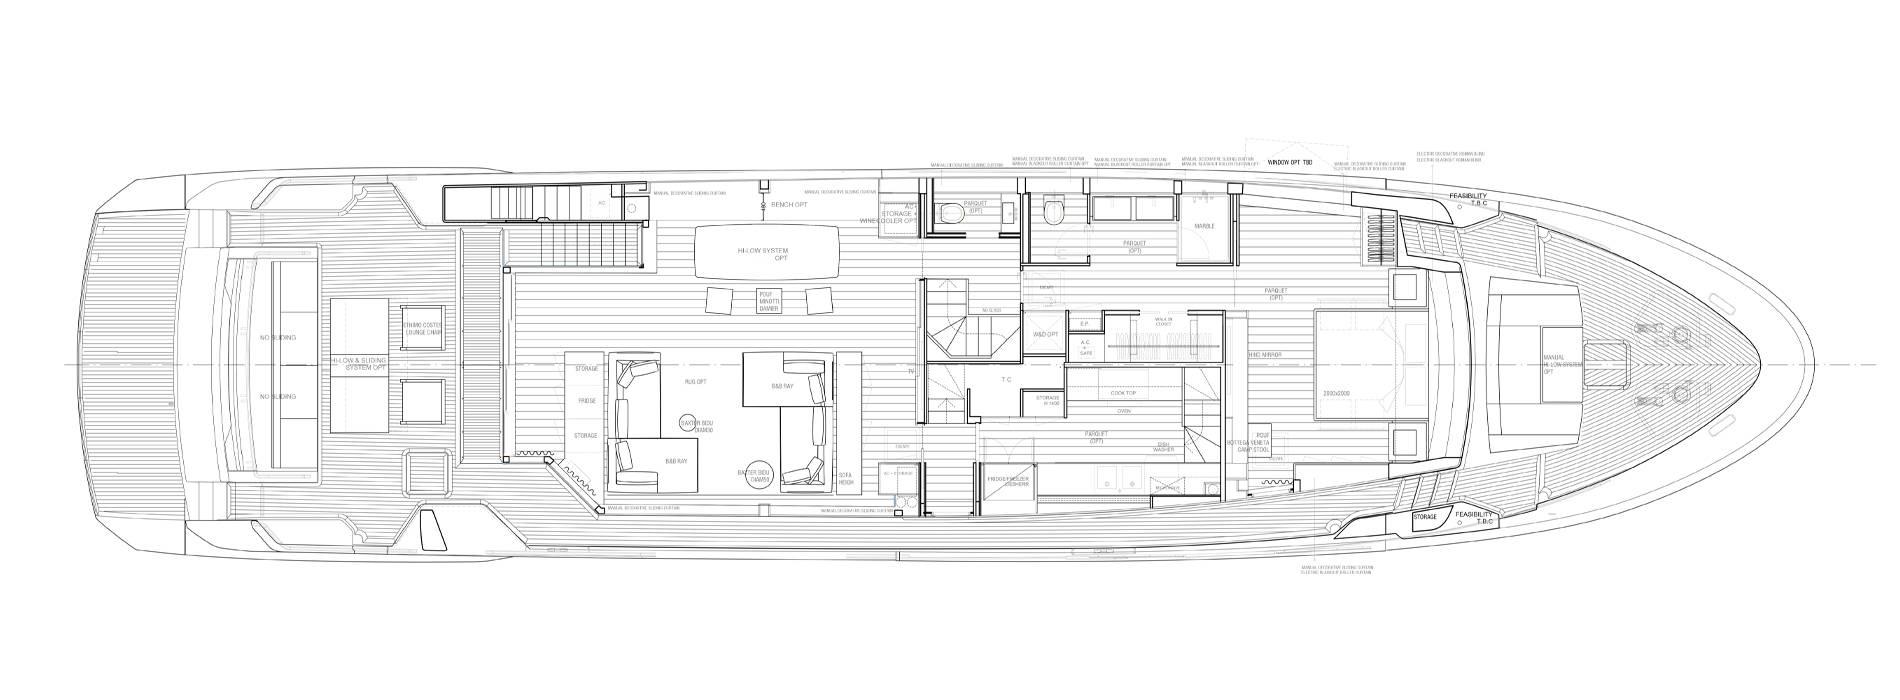 Sanlorenzo Yachts SL102A-746 Cubierta principal